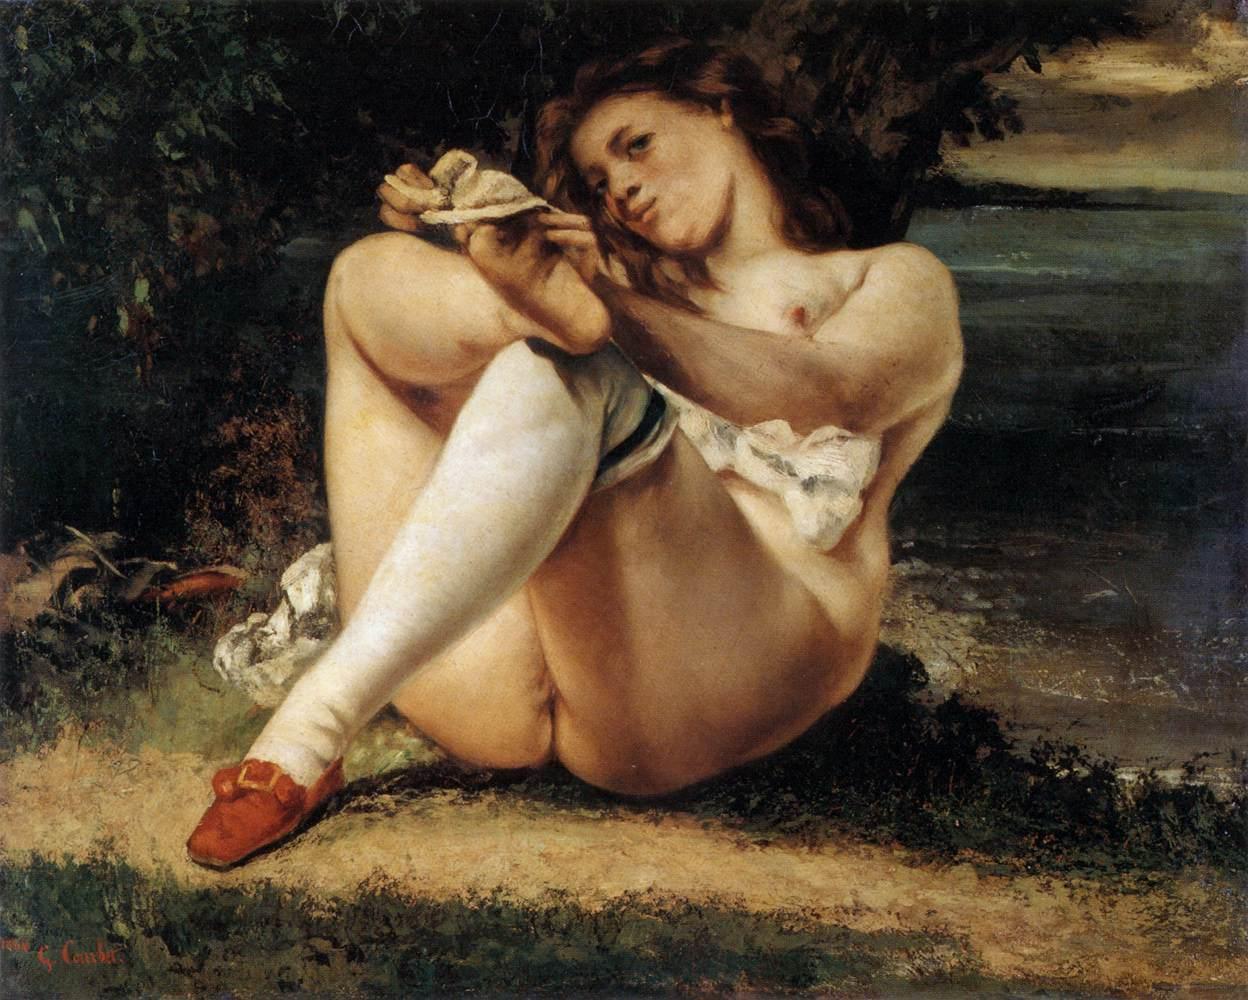 Гюстав Курбе. 1861. Женщина с белыми чулками (La Femme aux bas blancs (Woman with White Stockings)). 65 х 81. Холст, масло. Филадельфия, Фонд Барнса.